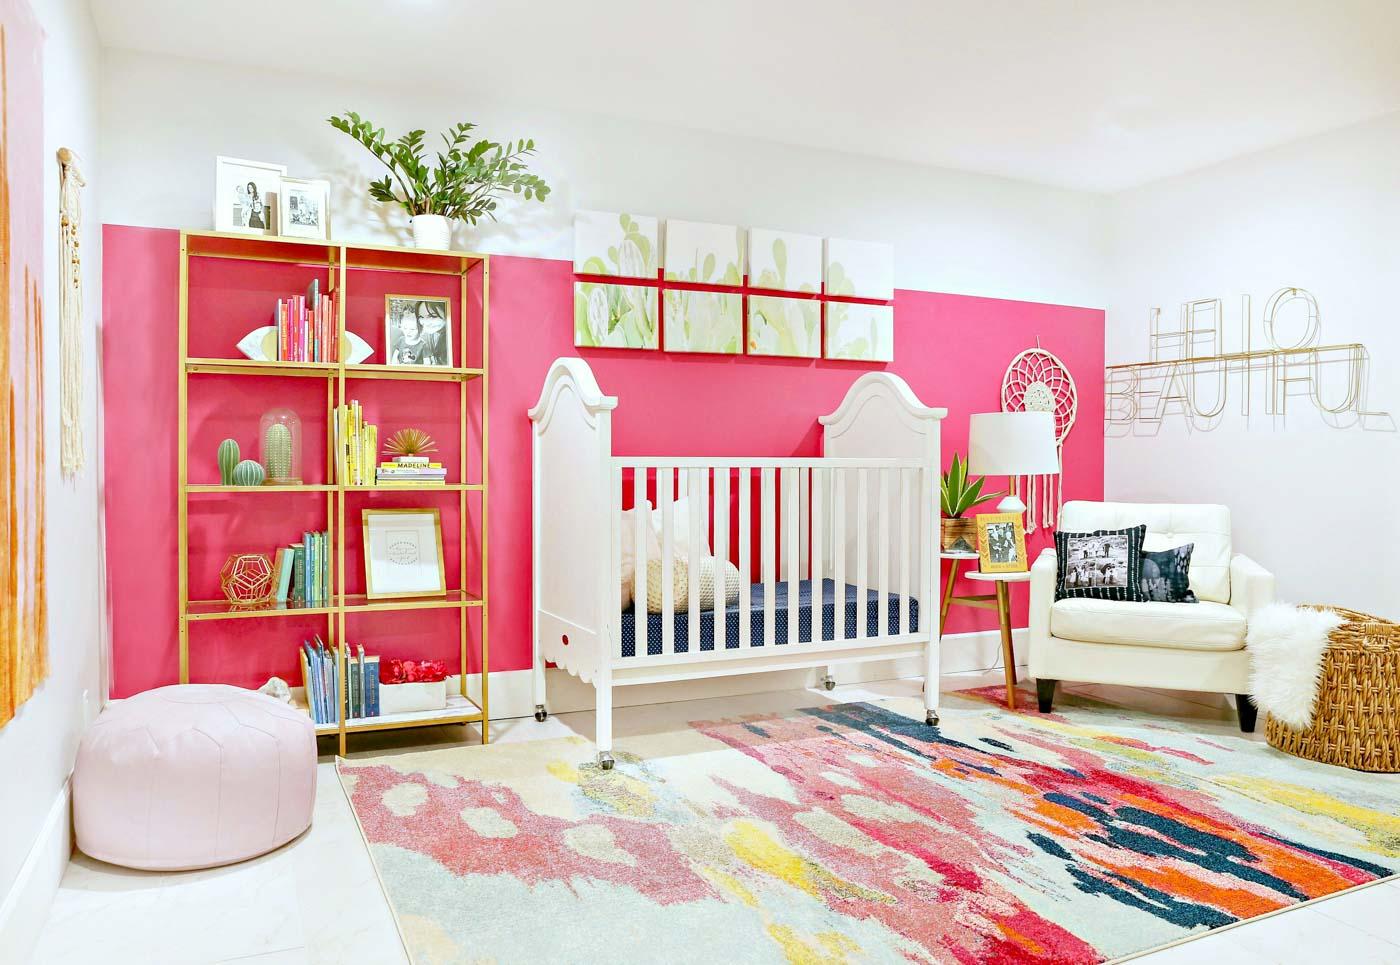 Nifty Girl Nursery Ranch Colorful Baby Girl Nursery Clutter Baby Girl Nursery Room Ideas Baby Girl Nursery Color Schemes baby Baby Girl Nursery